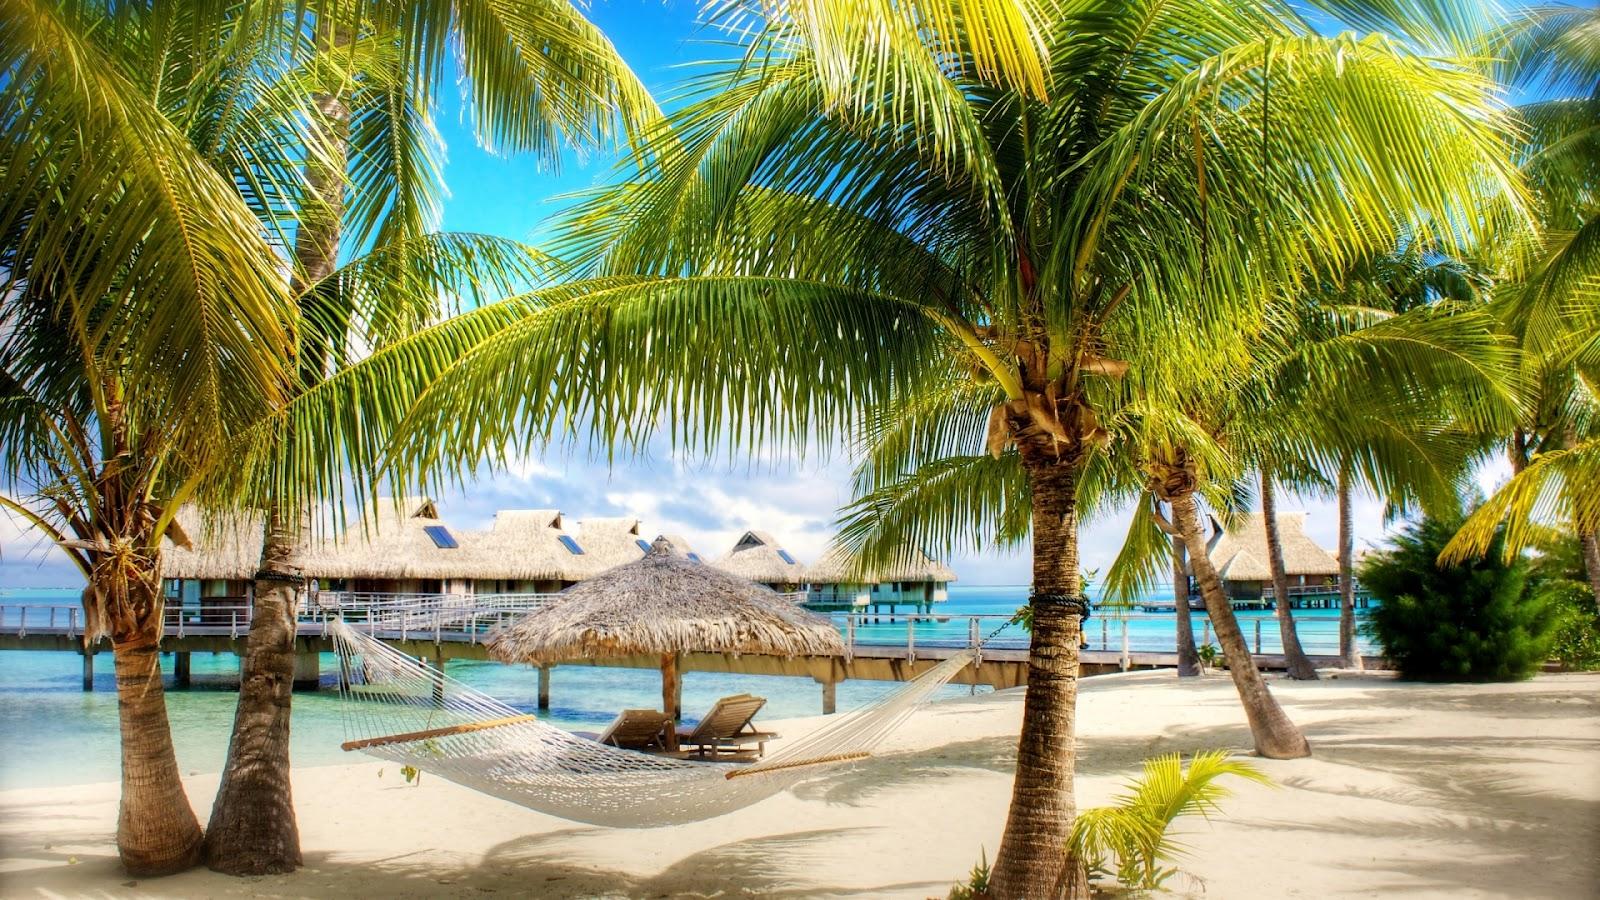 Exotic Vacation  Full HD Desktop Wallpapers 1080p